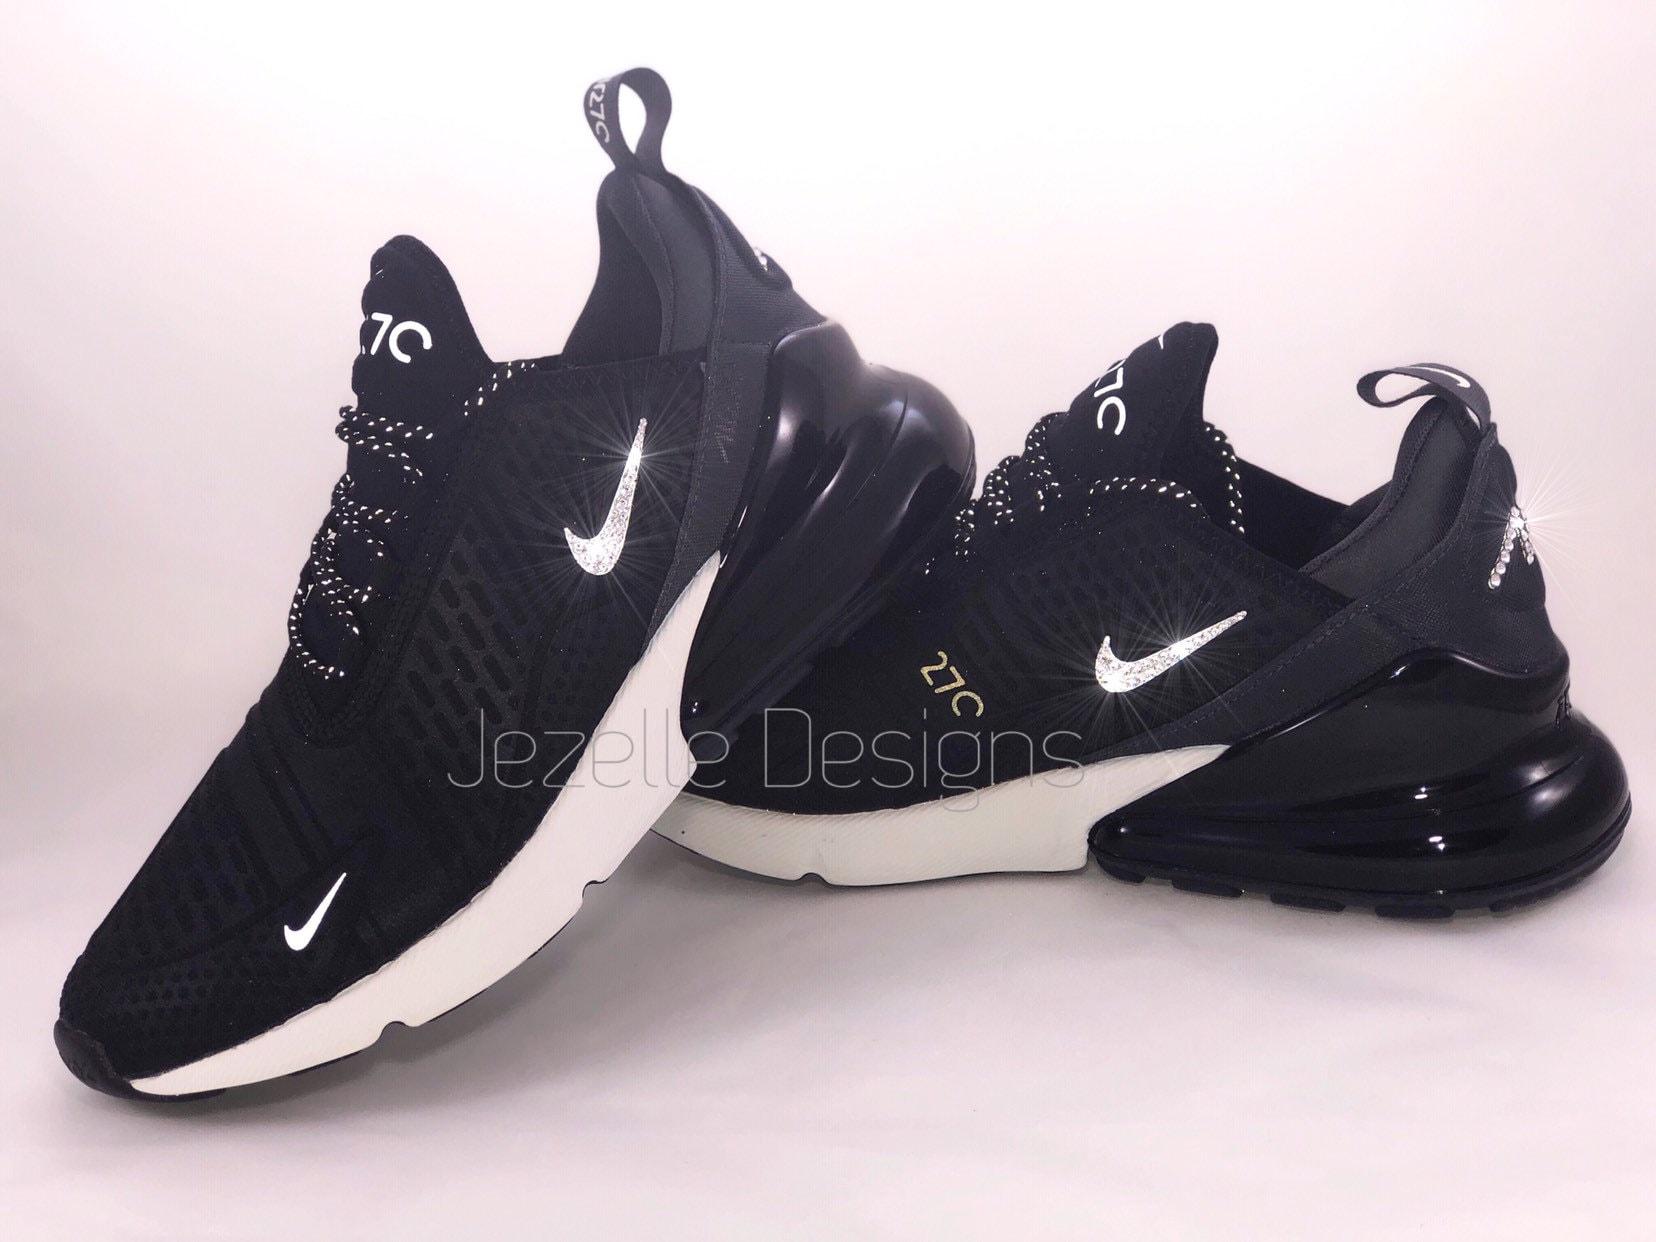 a9d28175b92517 SIZE 9.5 Swarovski Nike Air Max 270 SE Black White Hand